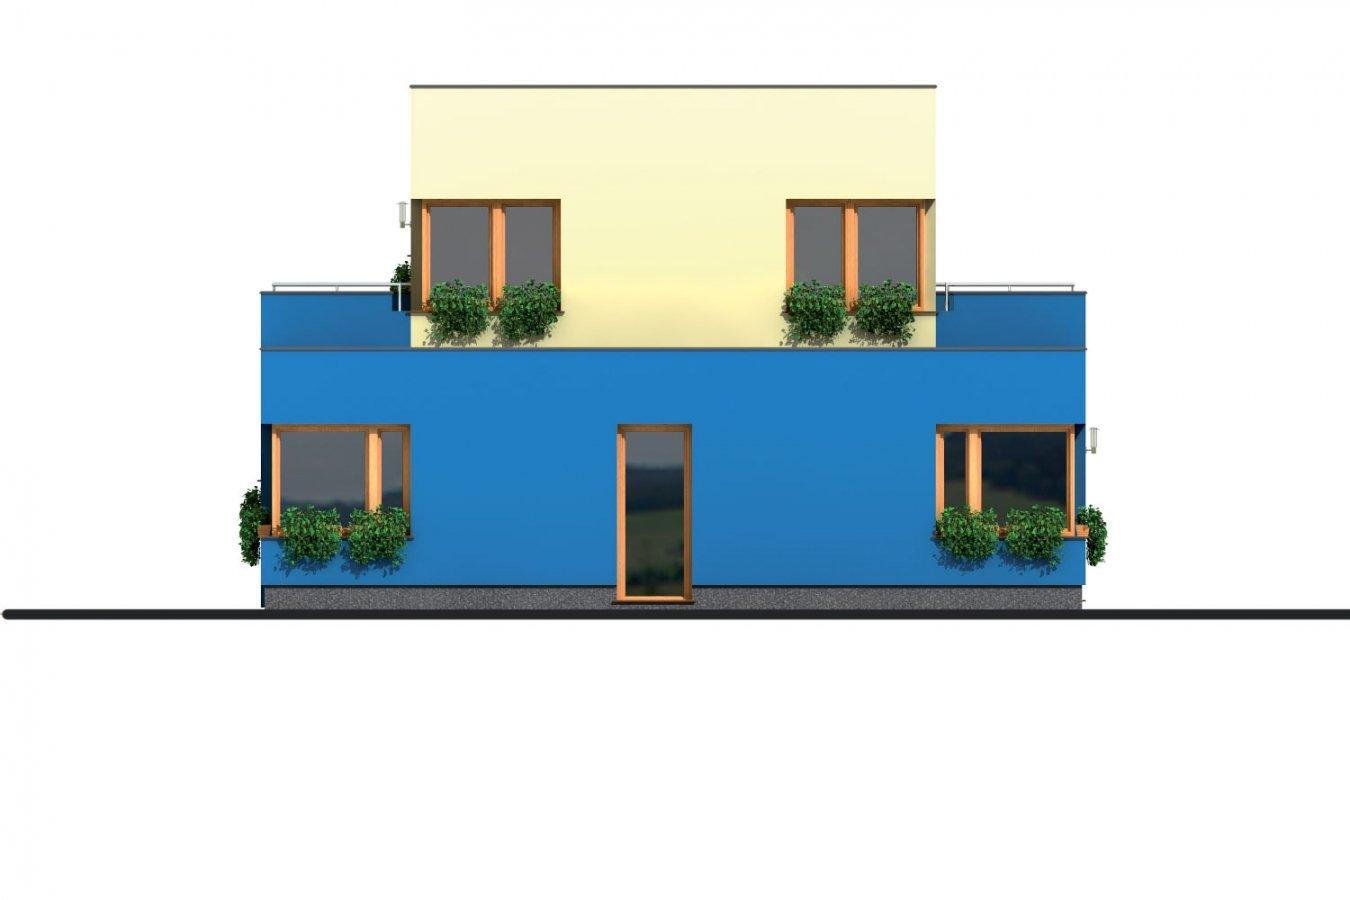 Pohľad 4. - Projekt moderného rodinného domu s plochou strechou a garážou